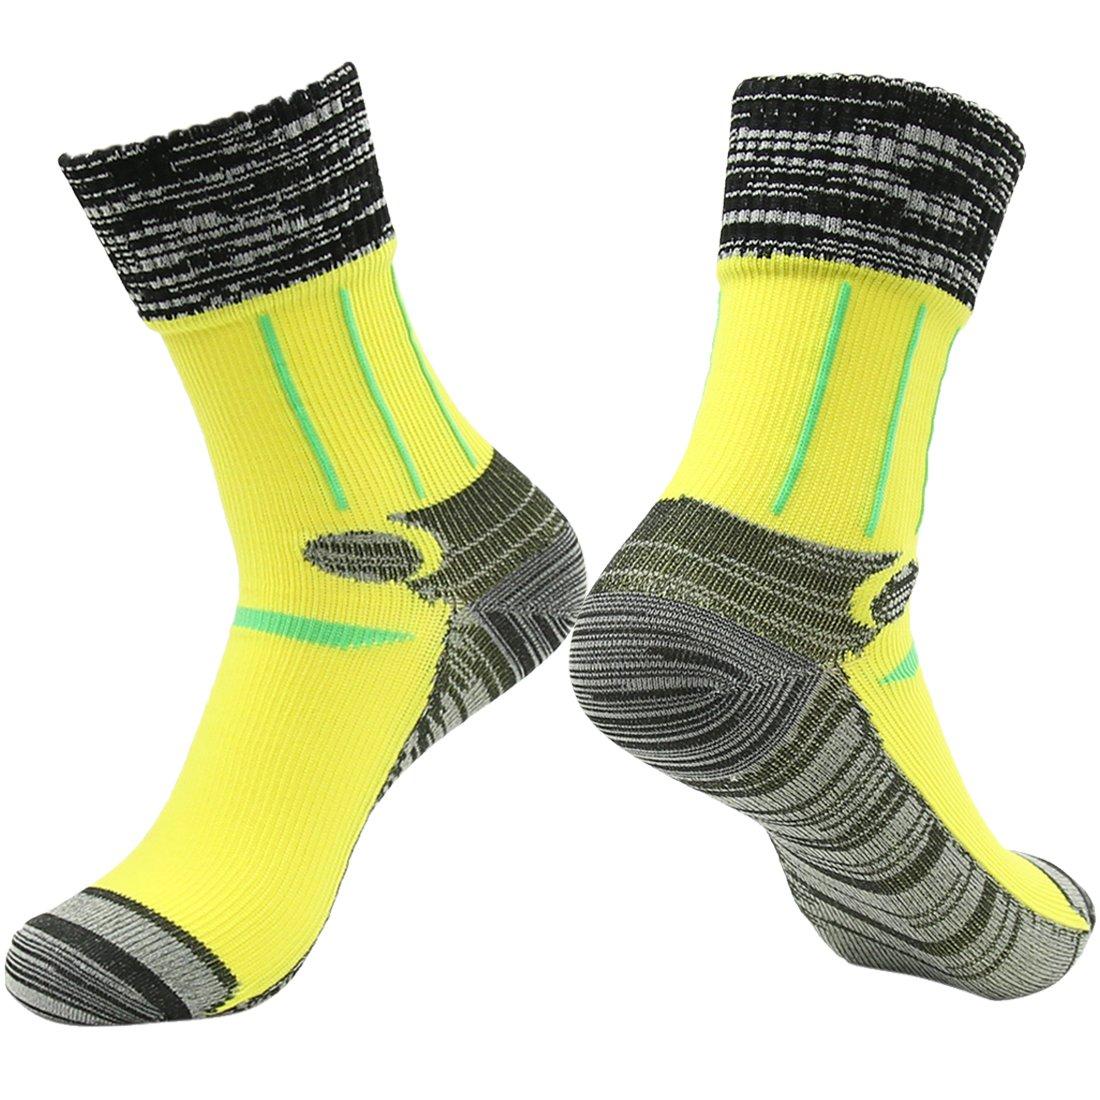 100% Waterproof Skiing Socks, RANDY SUN Women's Ultimate Cool-Lite Pro Crew Soft Socks Yellow Black Grey by RANDY SUN